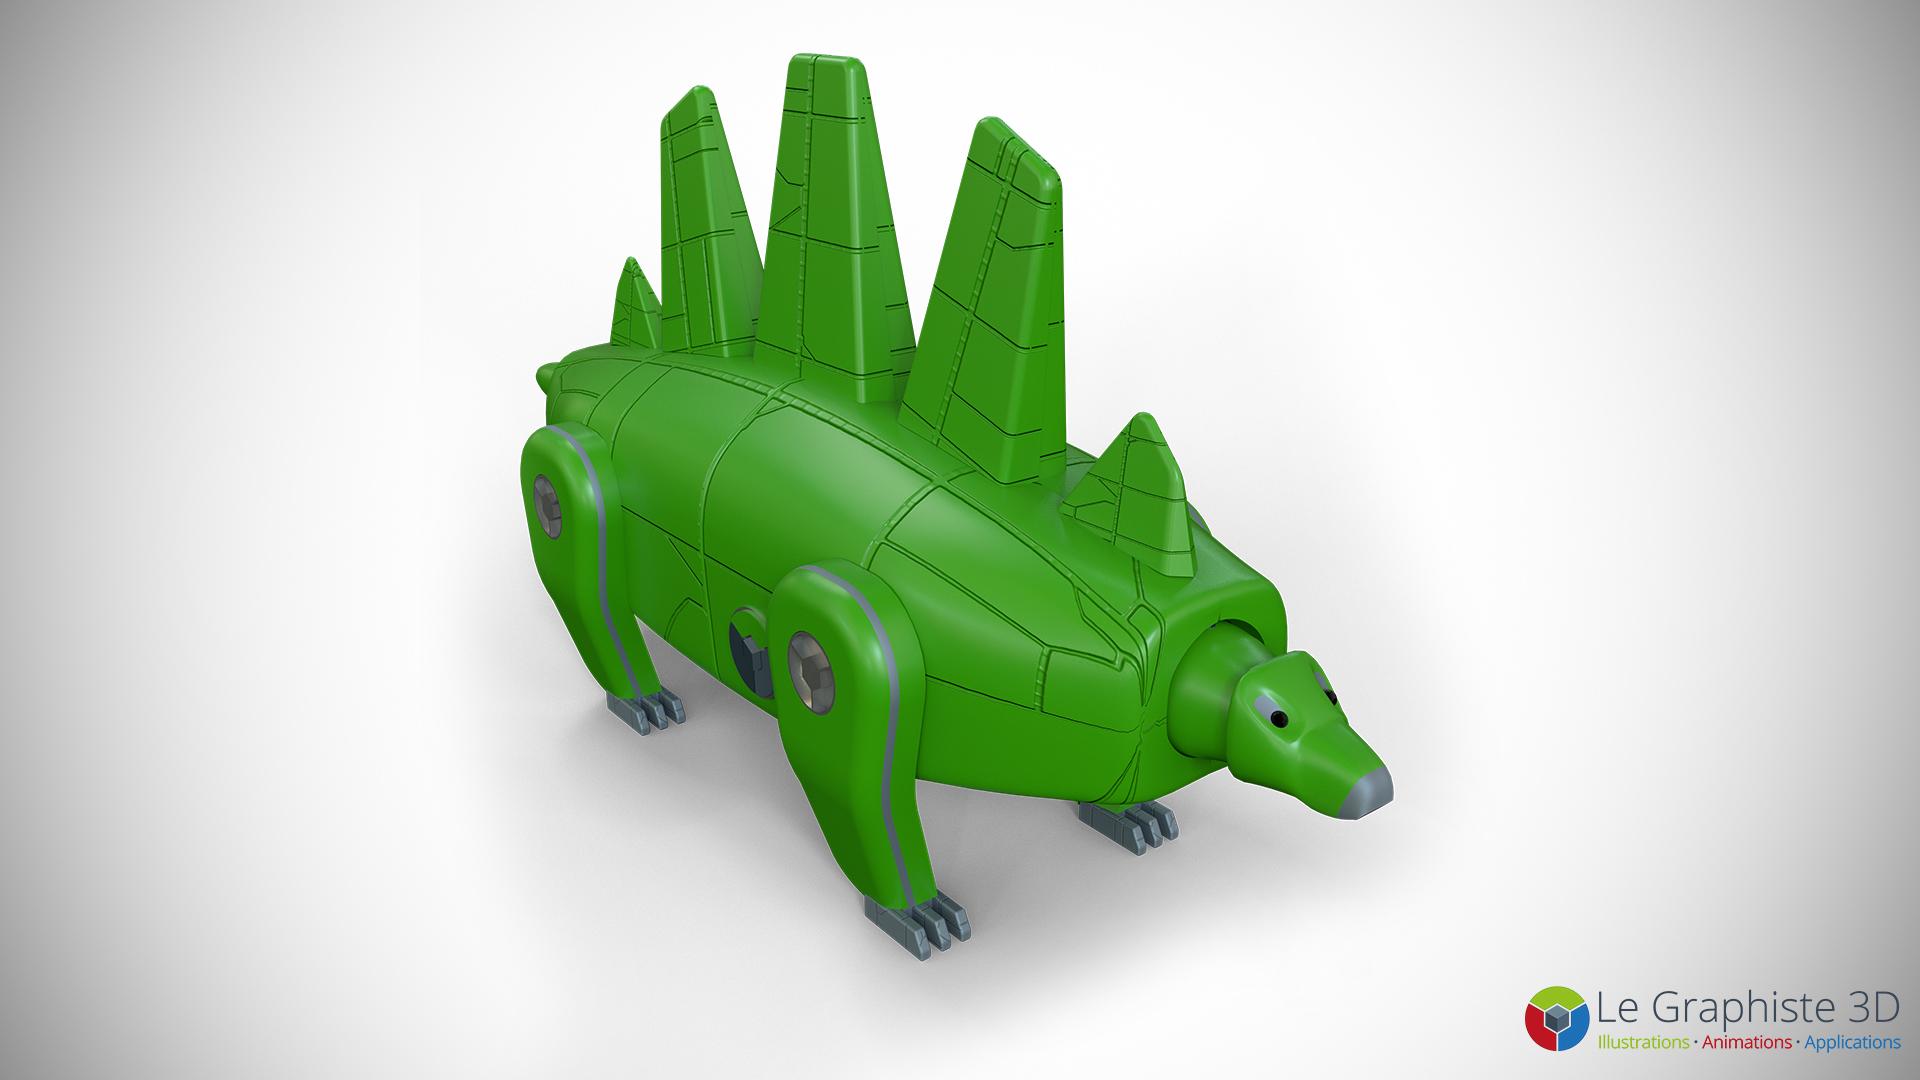 LG3D - Stégosaure - Bras du robot Mégasaure